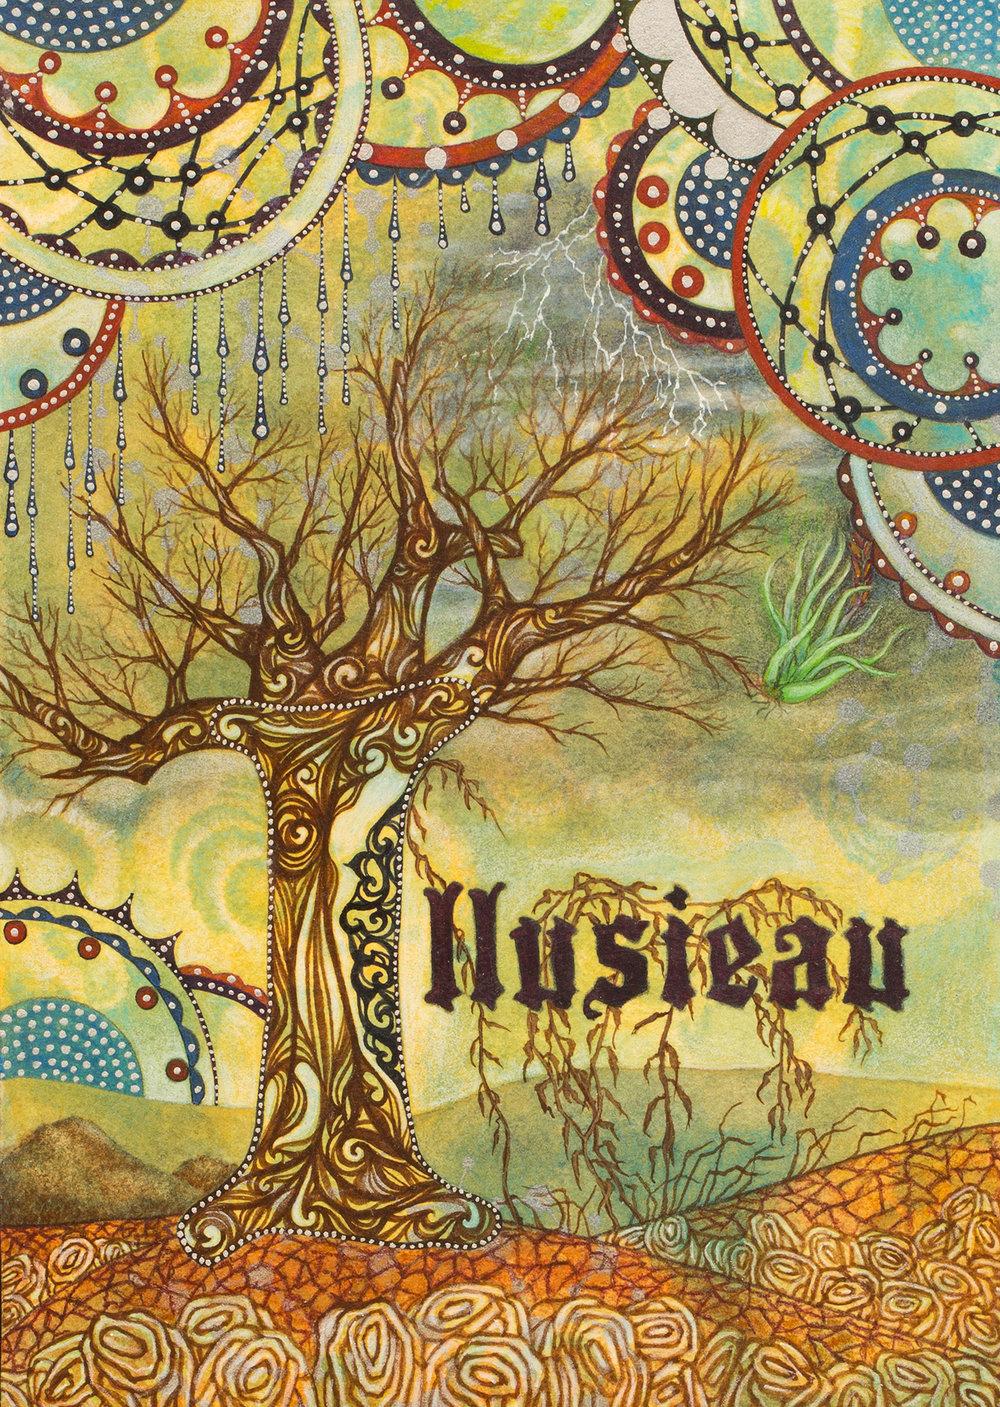 ● Illusieau